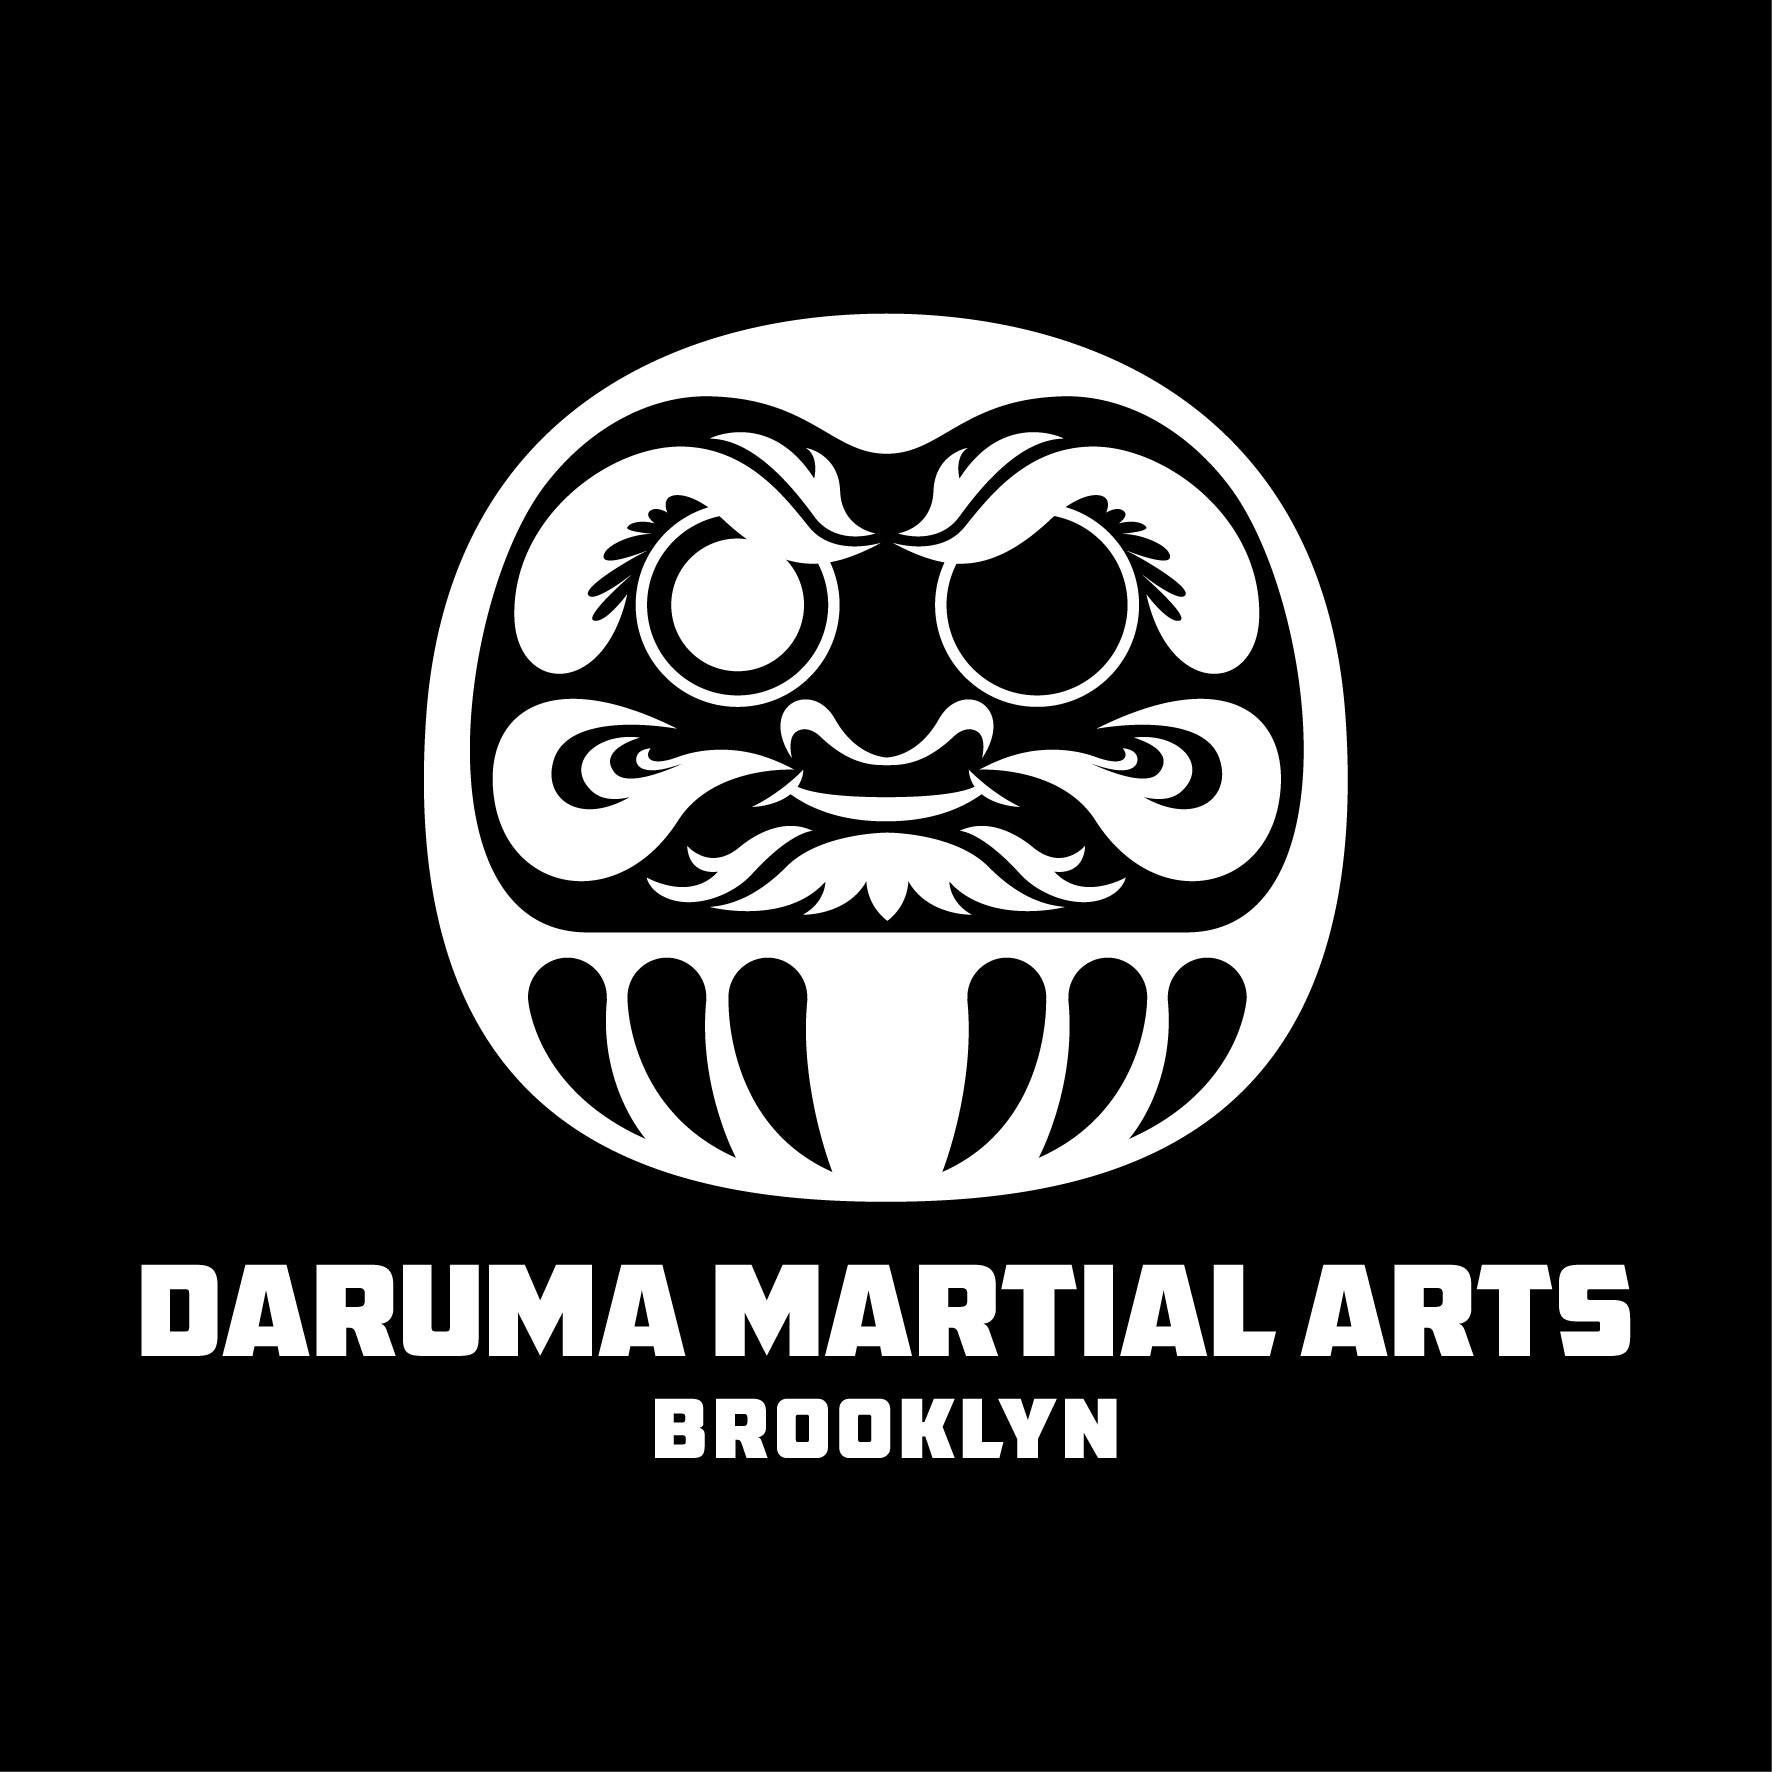 Daruma Martial Arts 2018